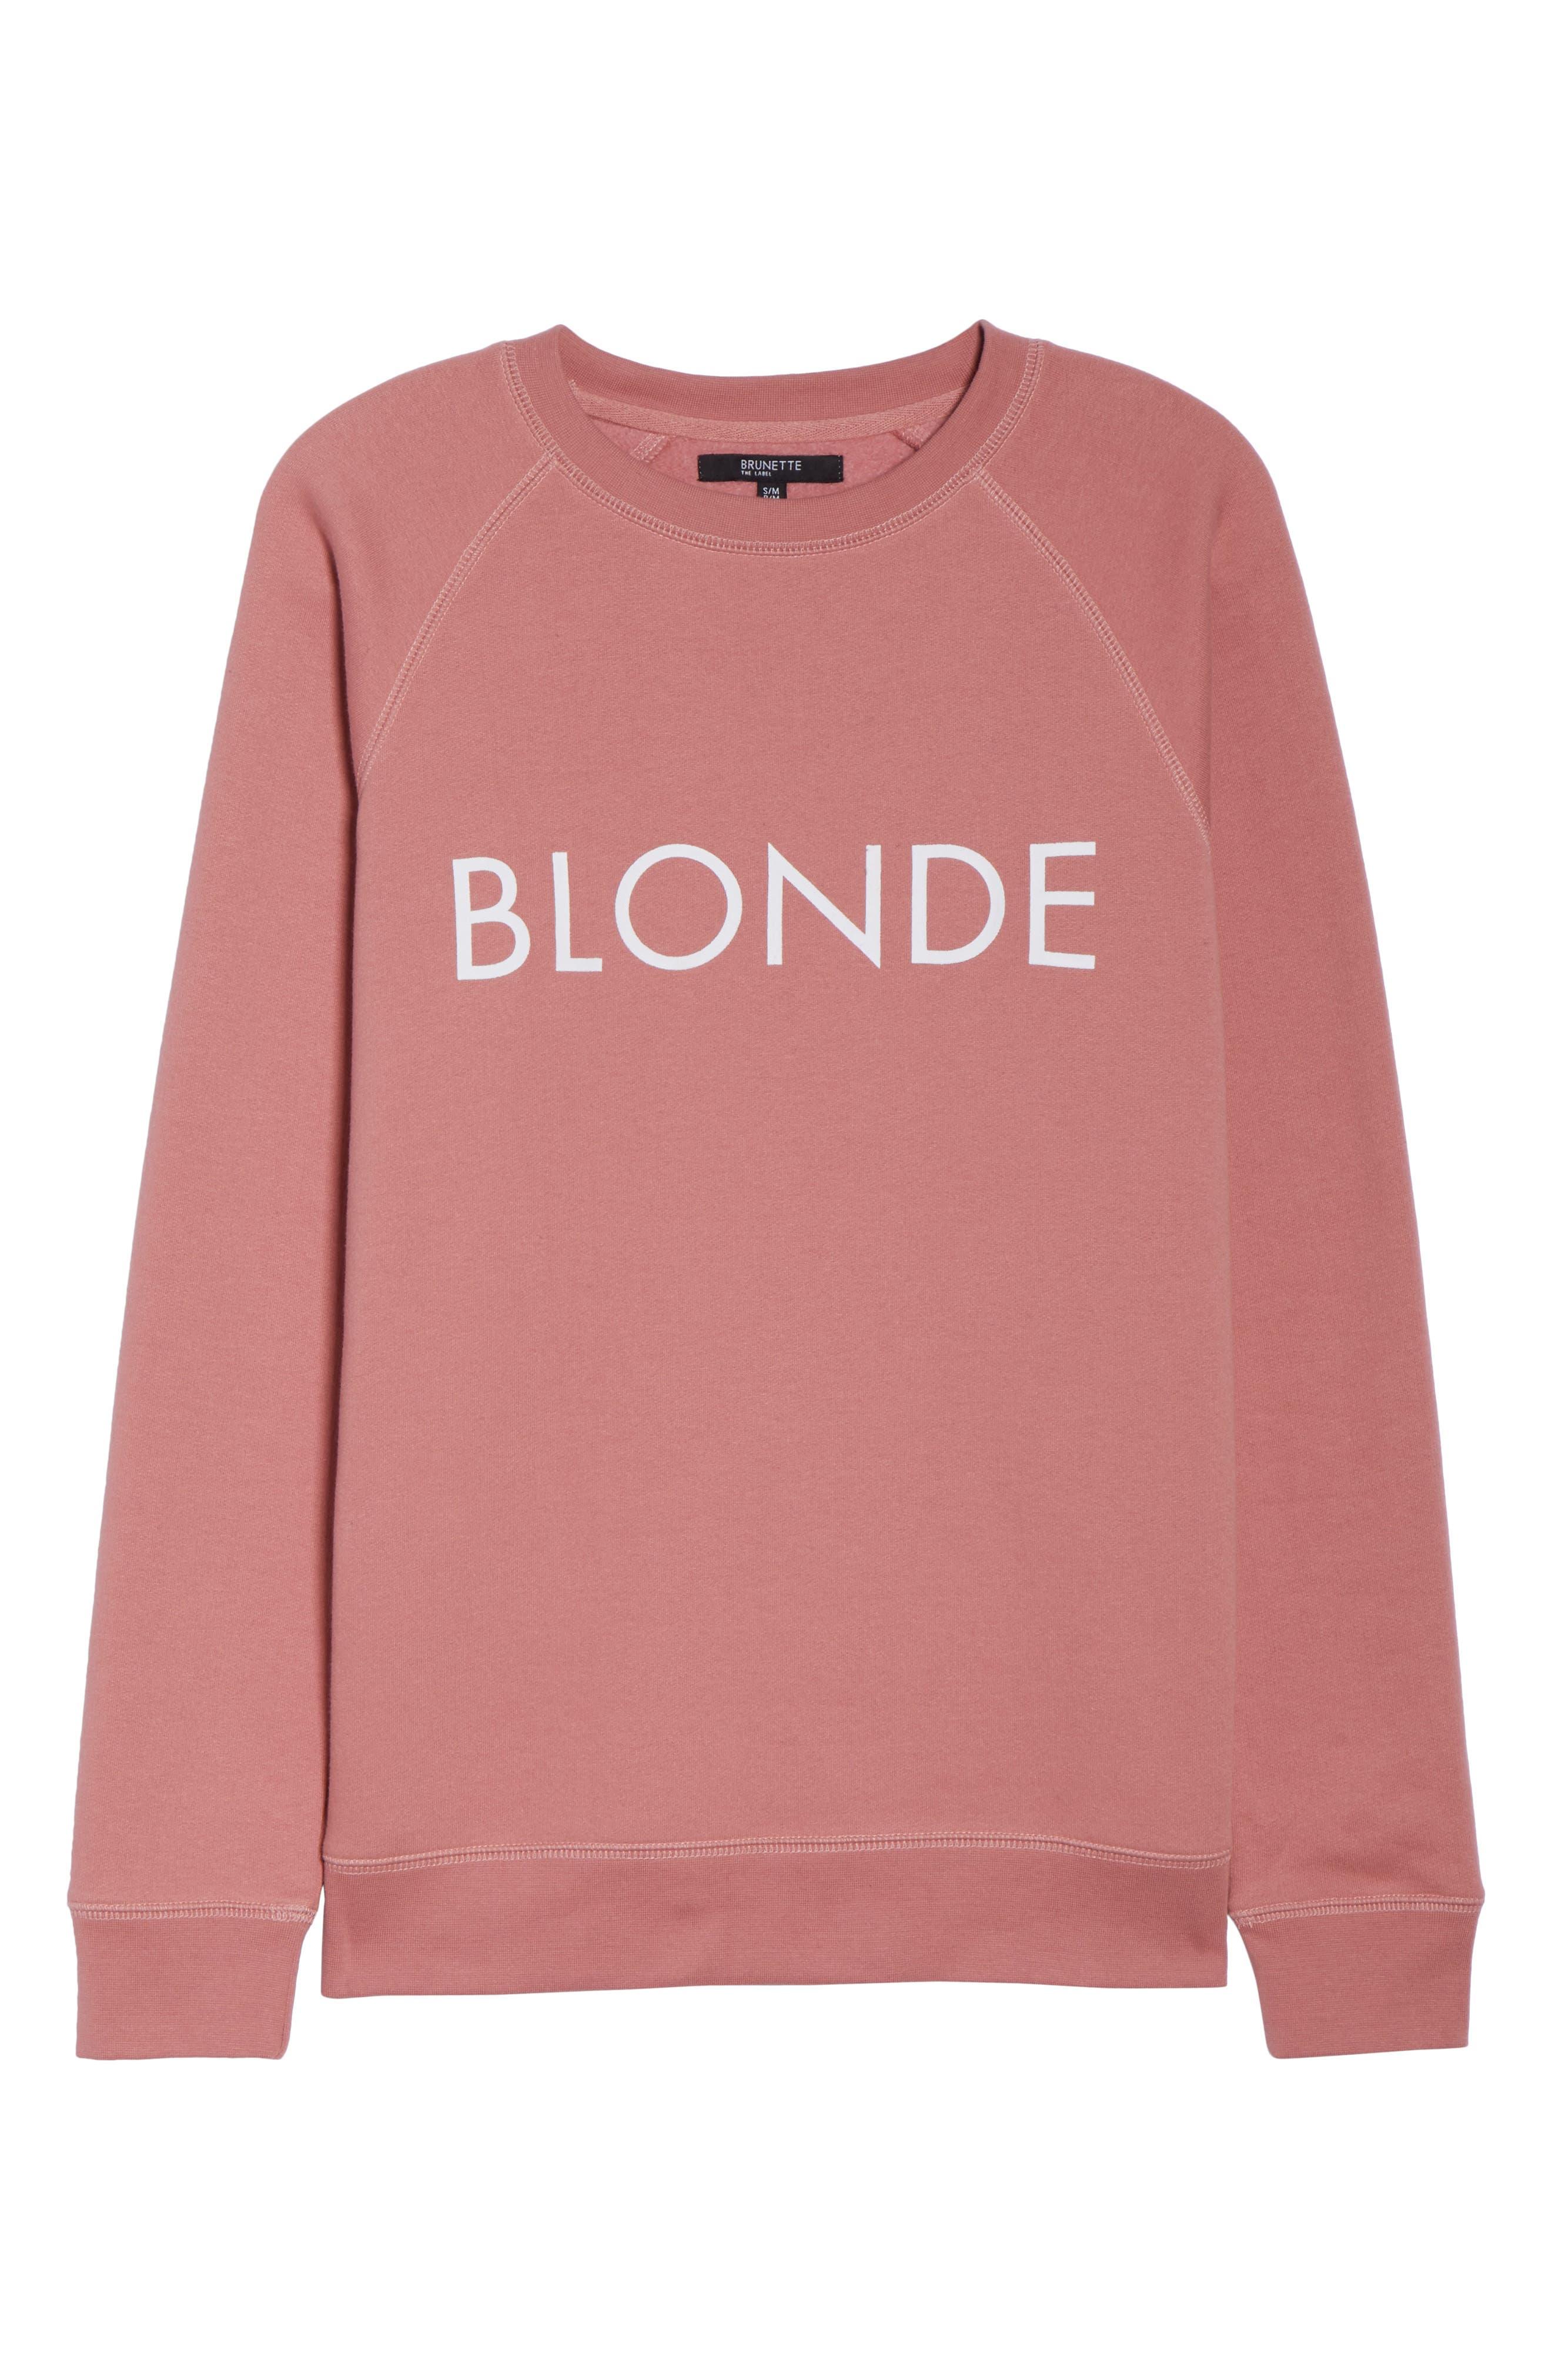 Blonde Crewneck Sweatshirt,                             Alternate thumbnail 6, color,                             953